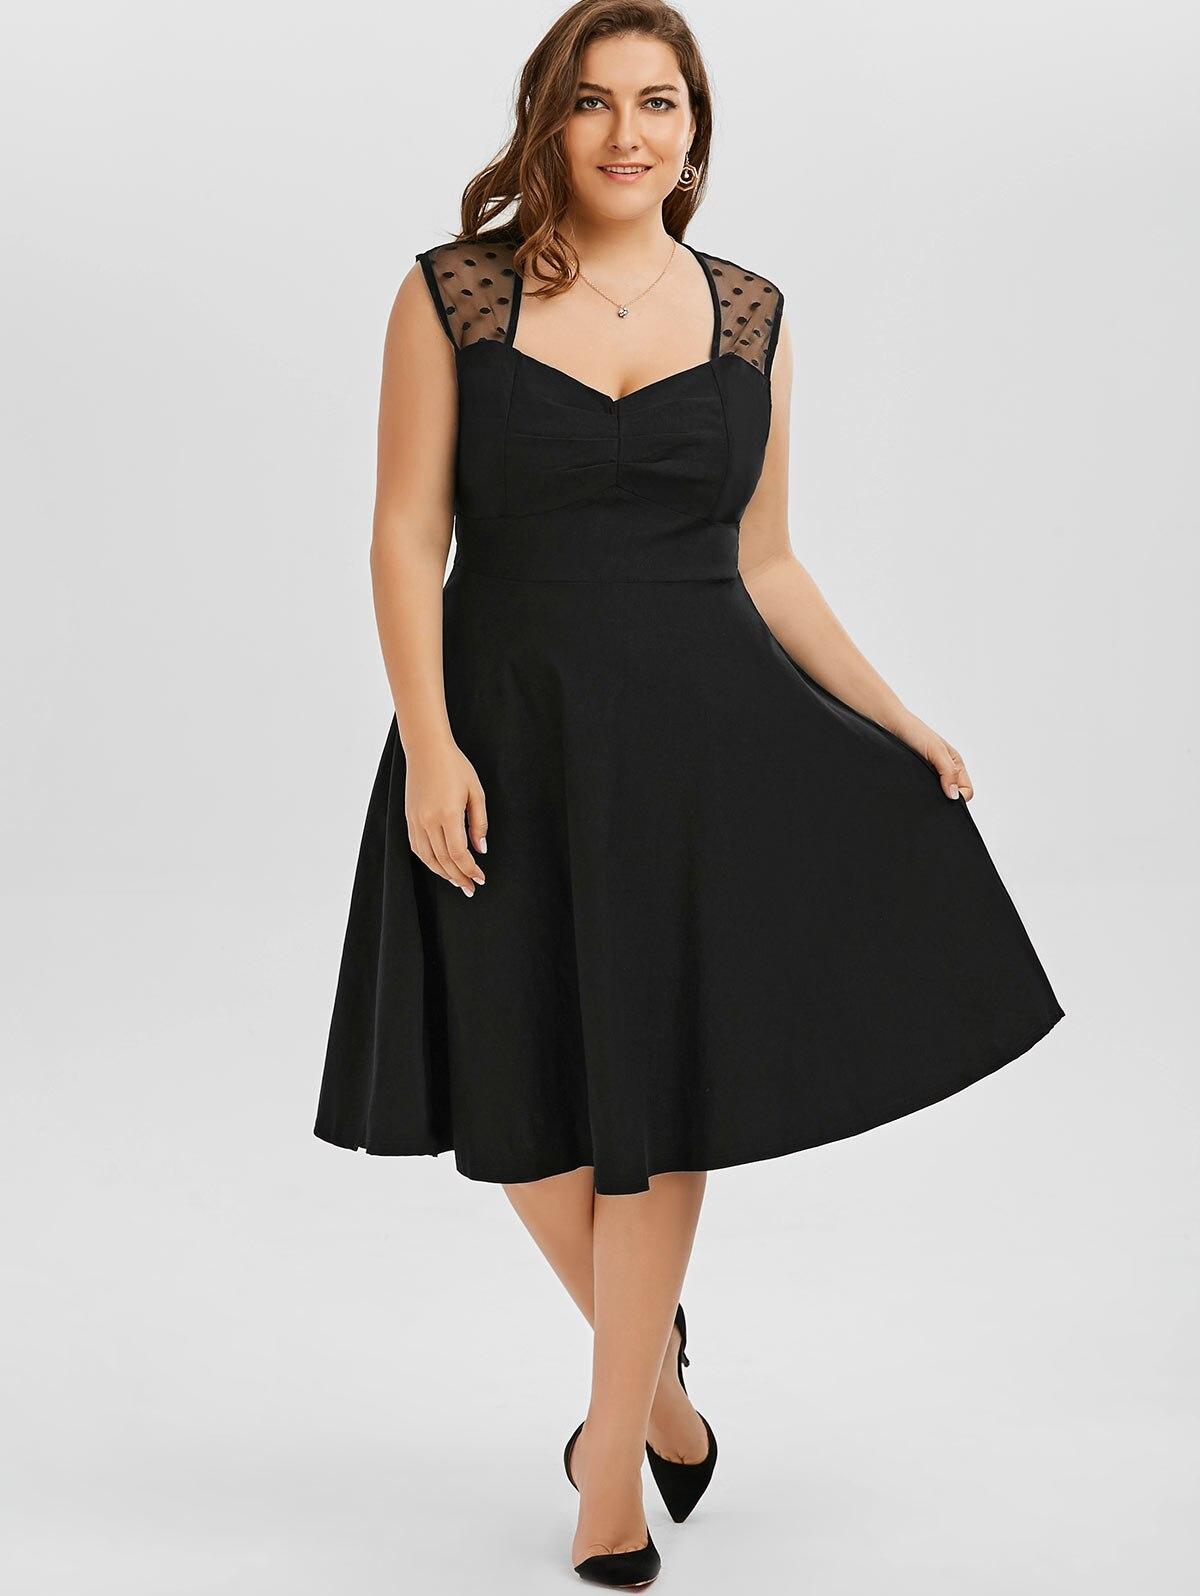 Wipalo Plus Size 5XL 4XL Vintage Retro Polka Dot Mesh Trim A Line Dress  Women Summer Sleeveless Midi Dress Office Work Vestidos